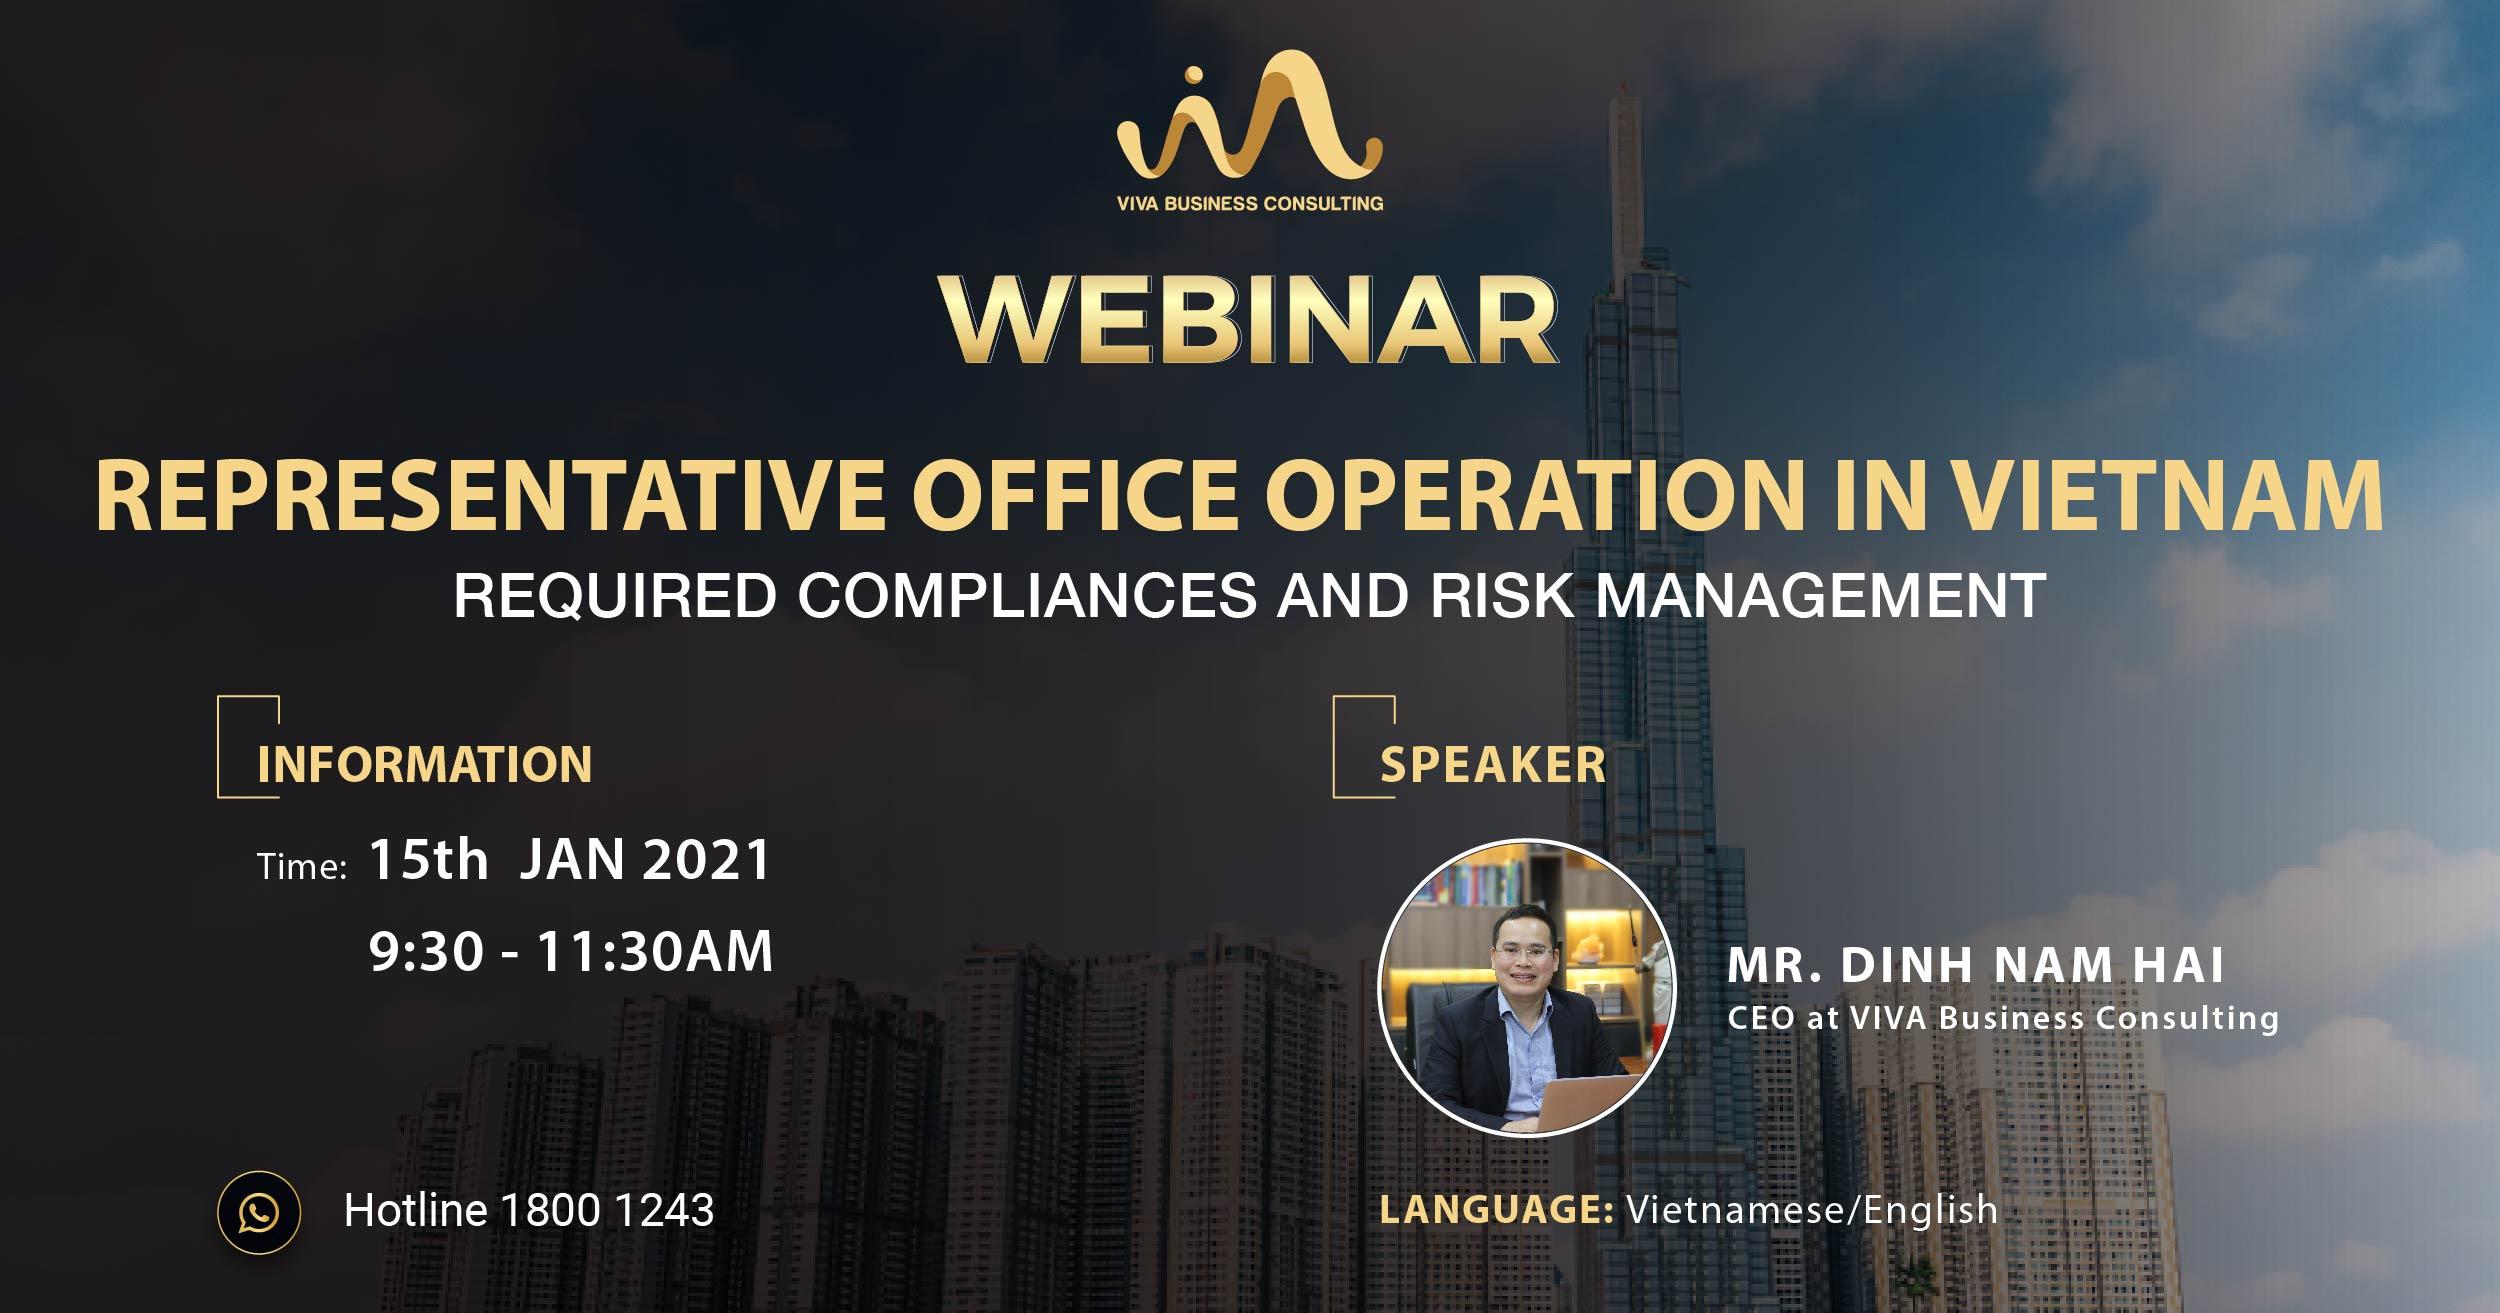 415 webinar 01 - [WEBINAR] REPRESENTATIVE OFFICE OPERATION IN VIETNAM – Risk management on operation